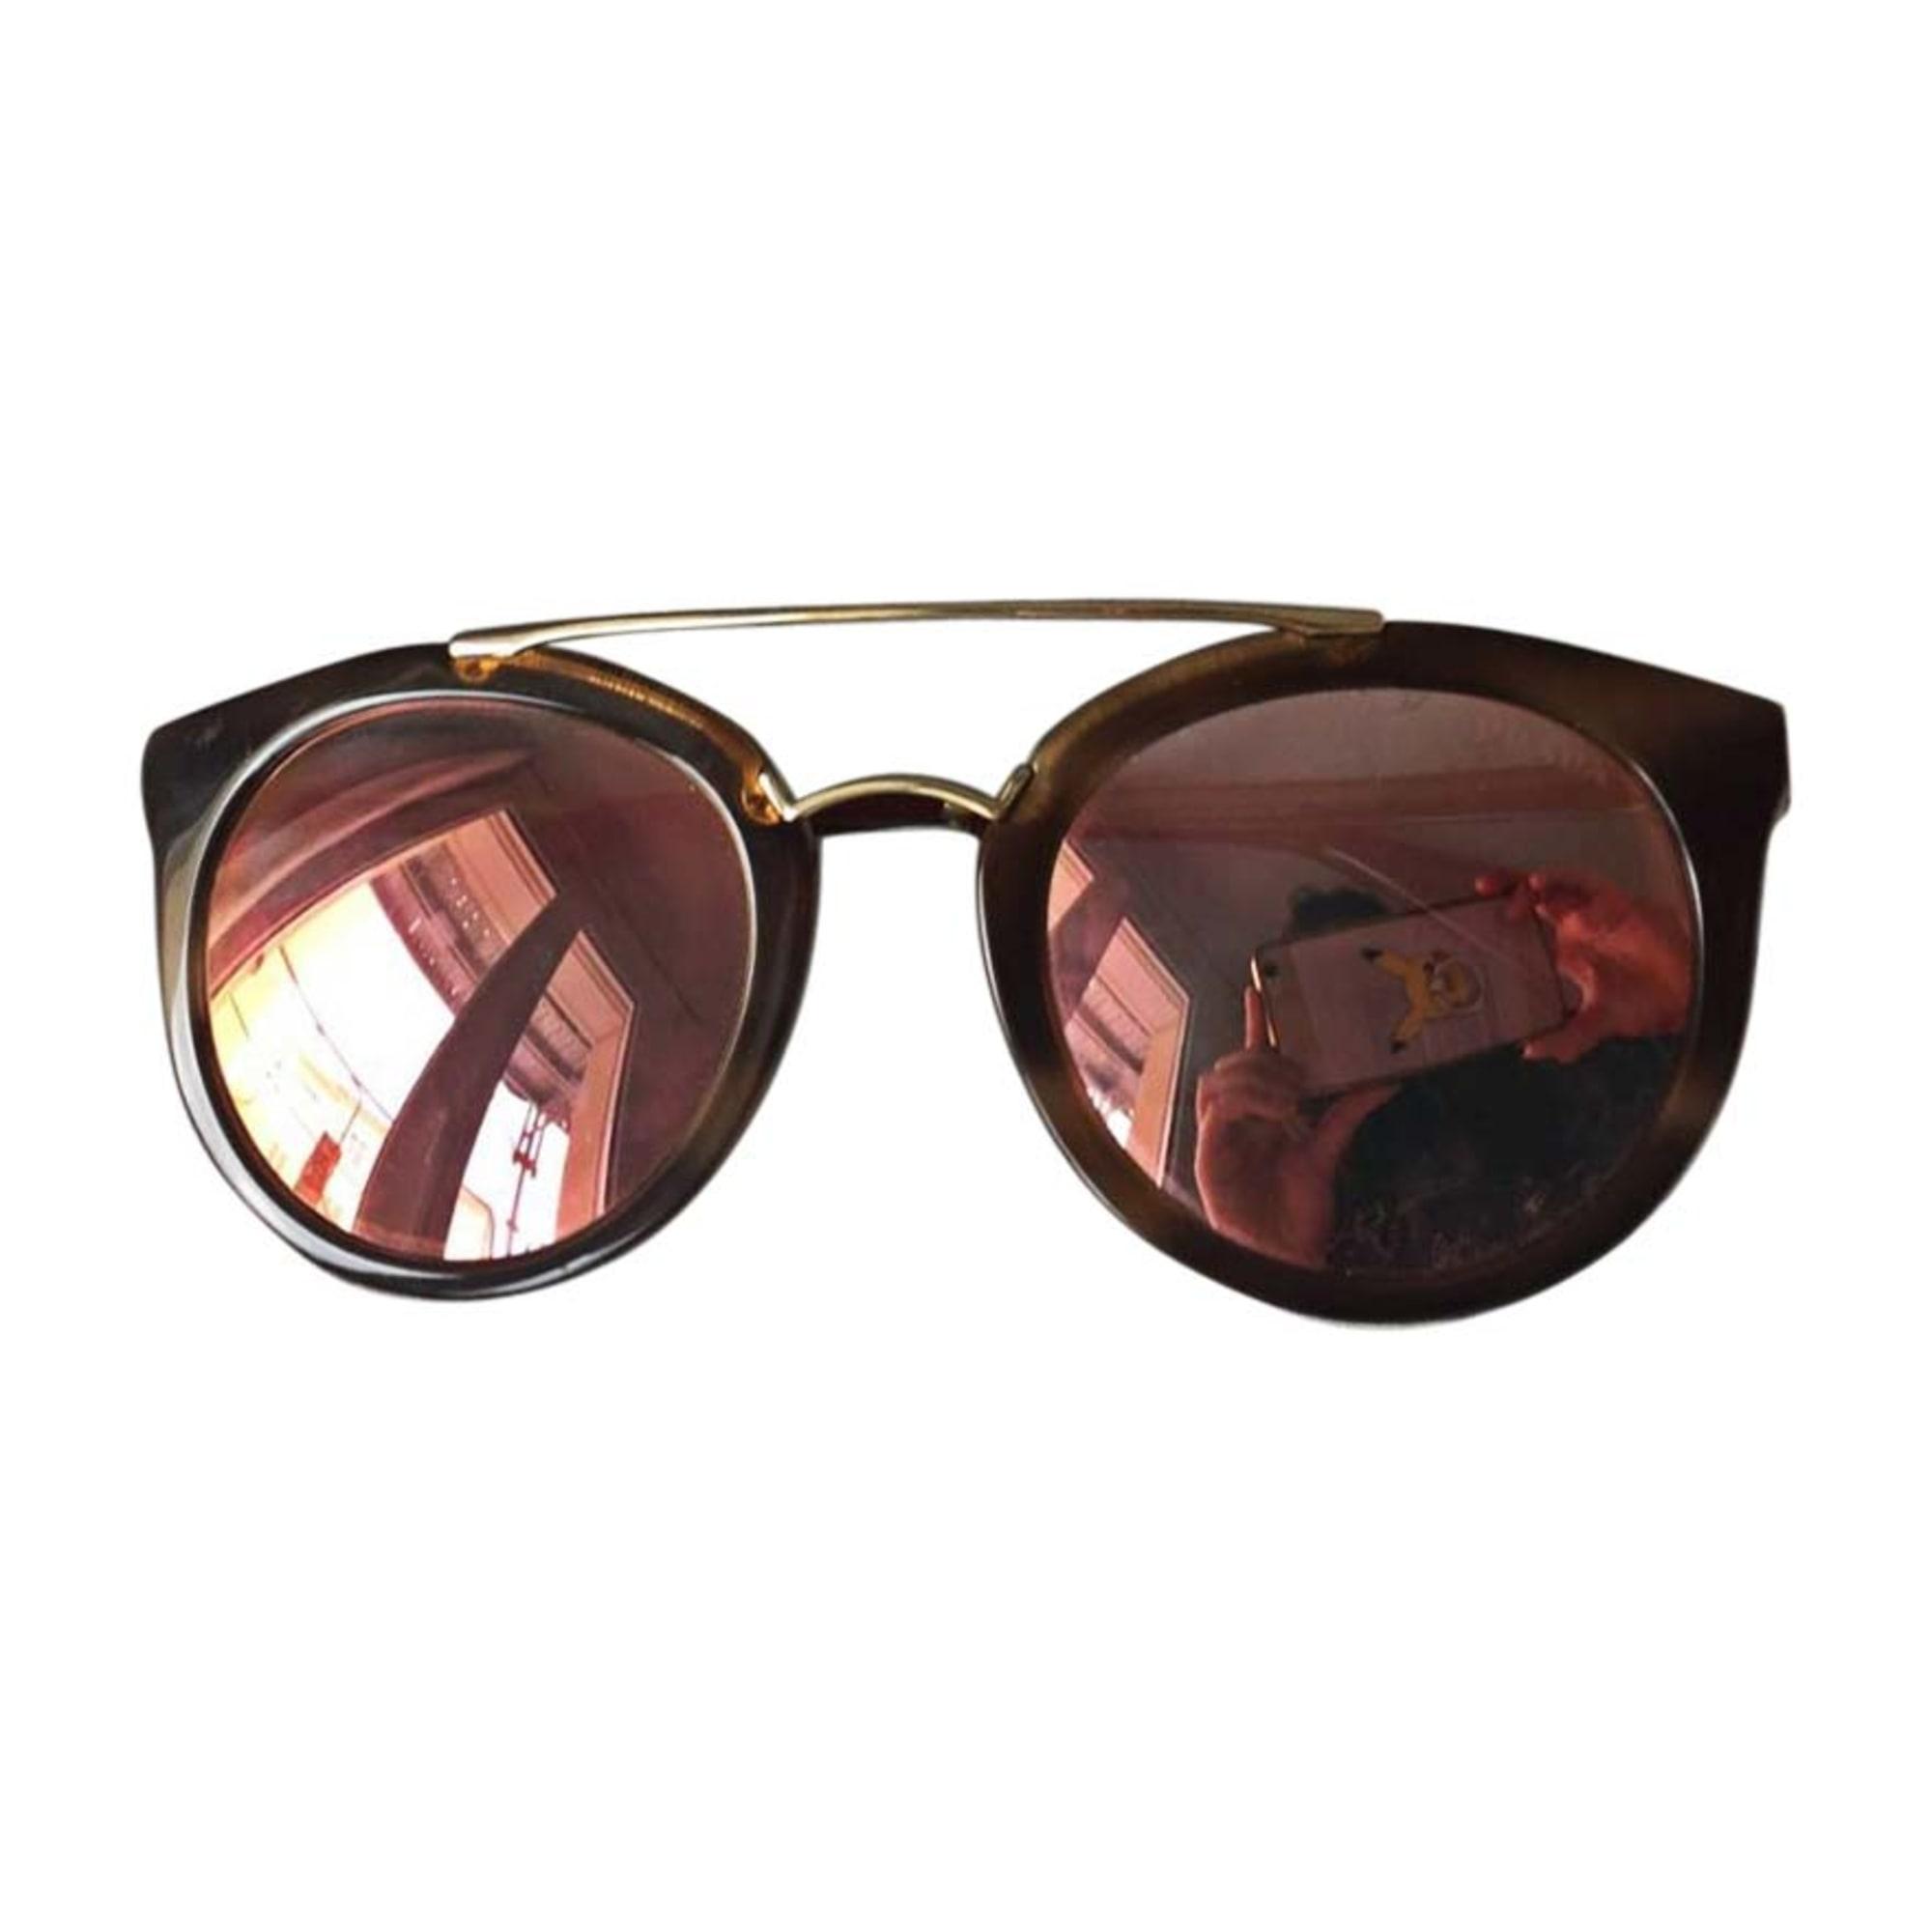 e18a74b6b9c4f ... australia sunglasses prada red burgundy 11cc5 393e3